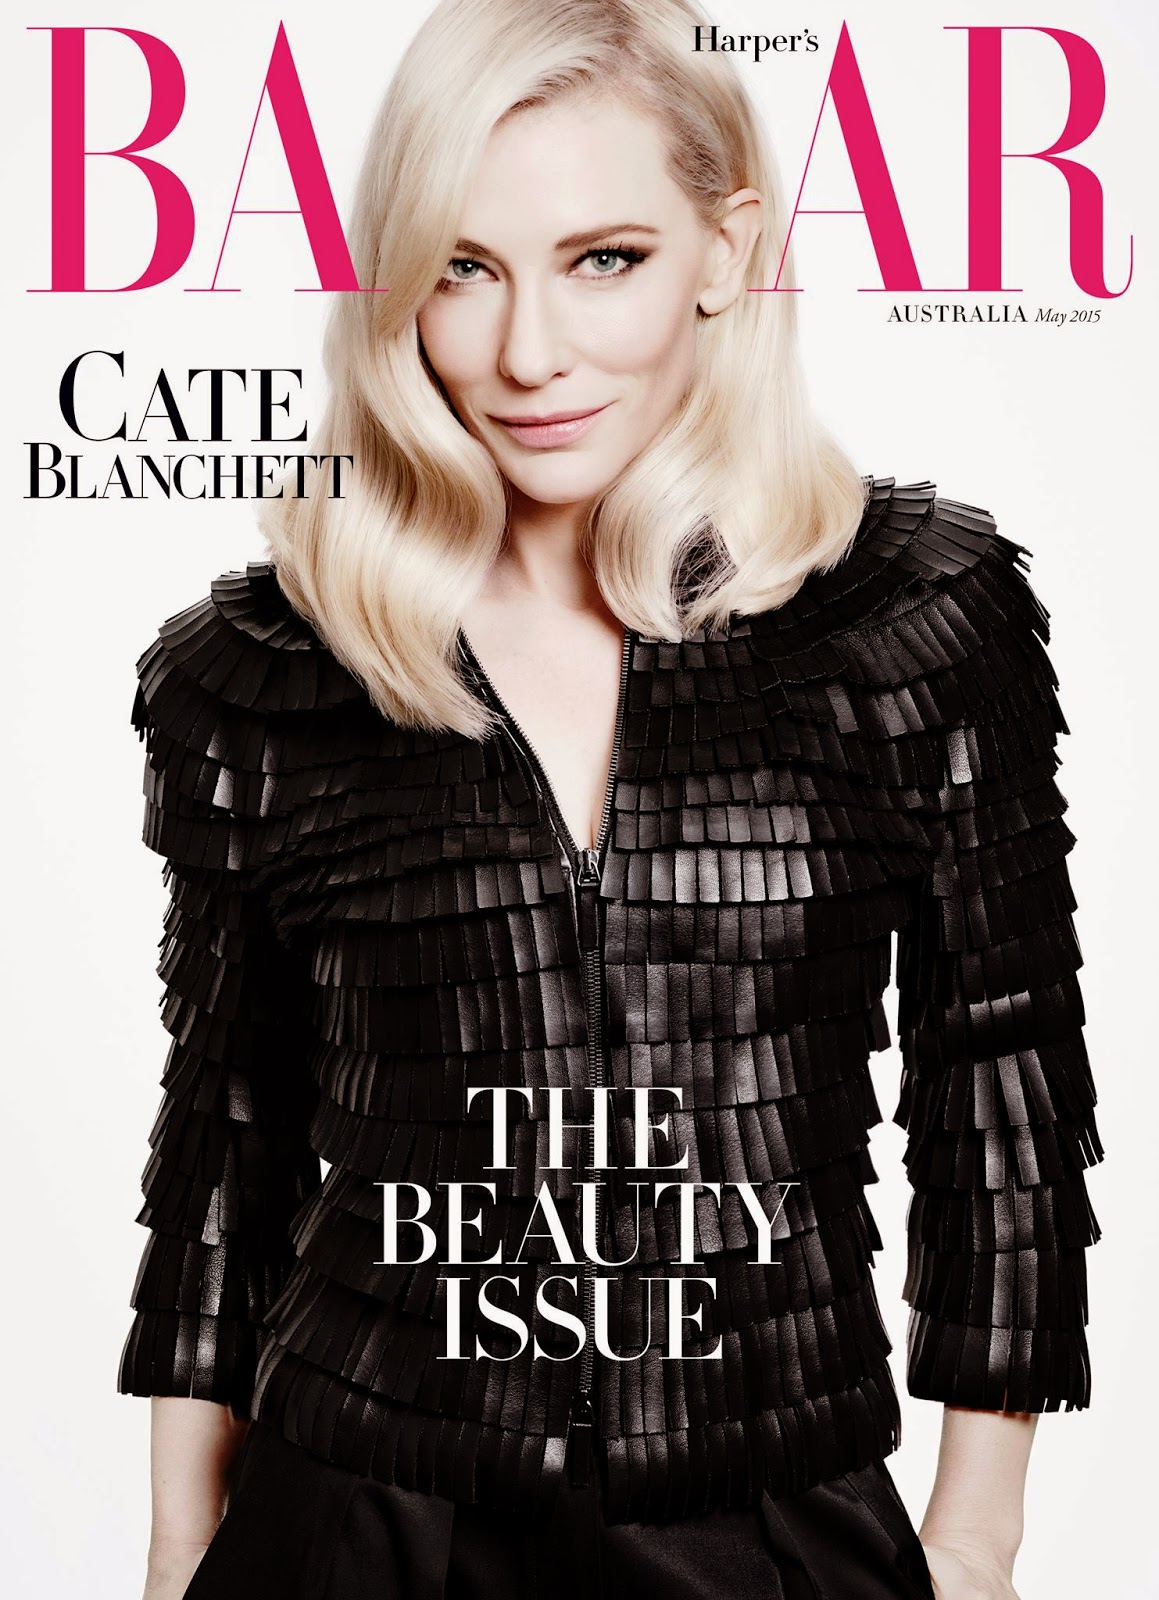 Actress @ Cate Blanchett - Harper's Bazaar Australia, May 2015